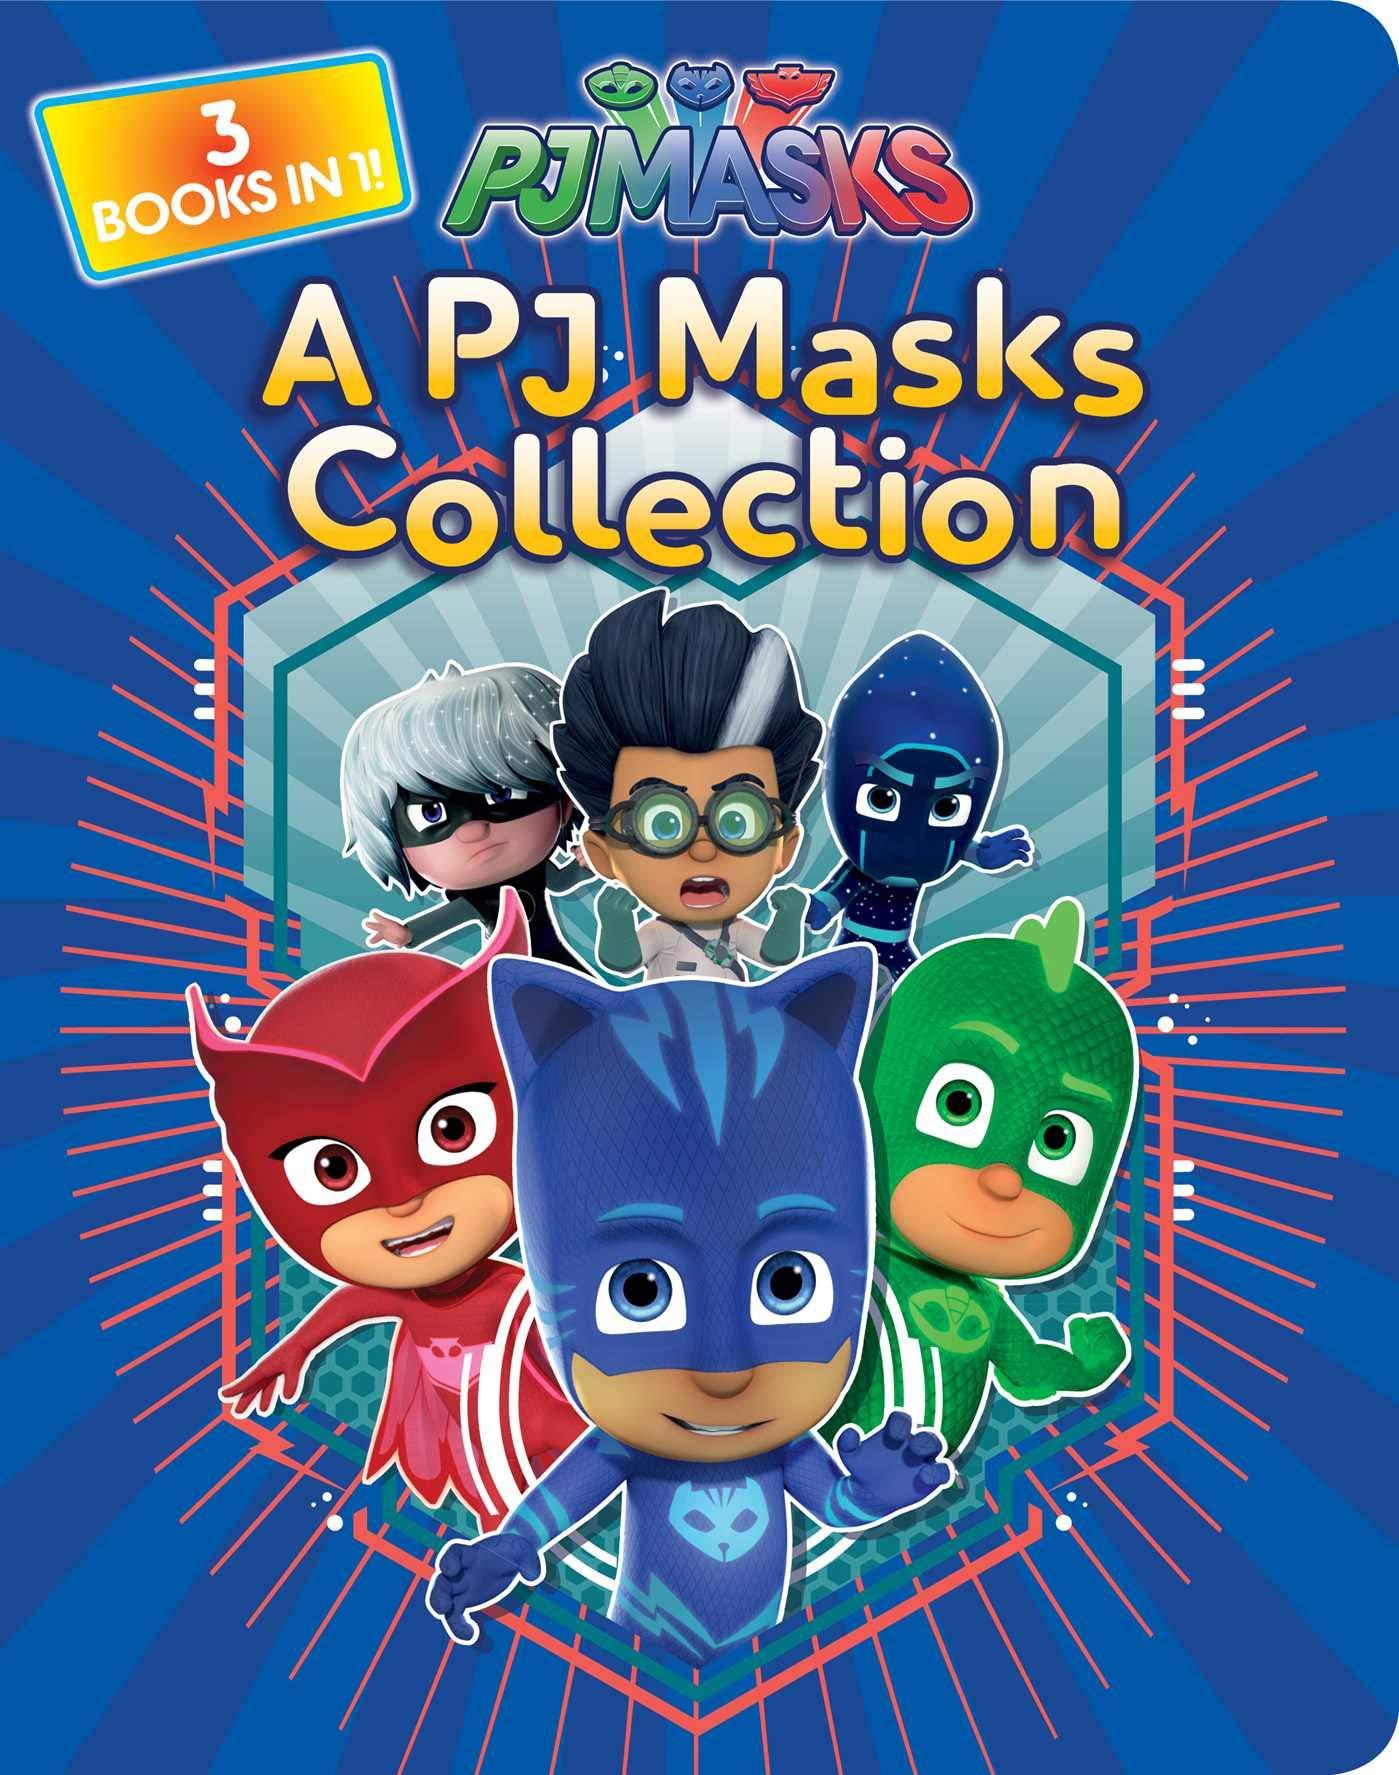 A PJ Masks Collection : Nakamura, May: Amazon.es: Libros